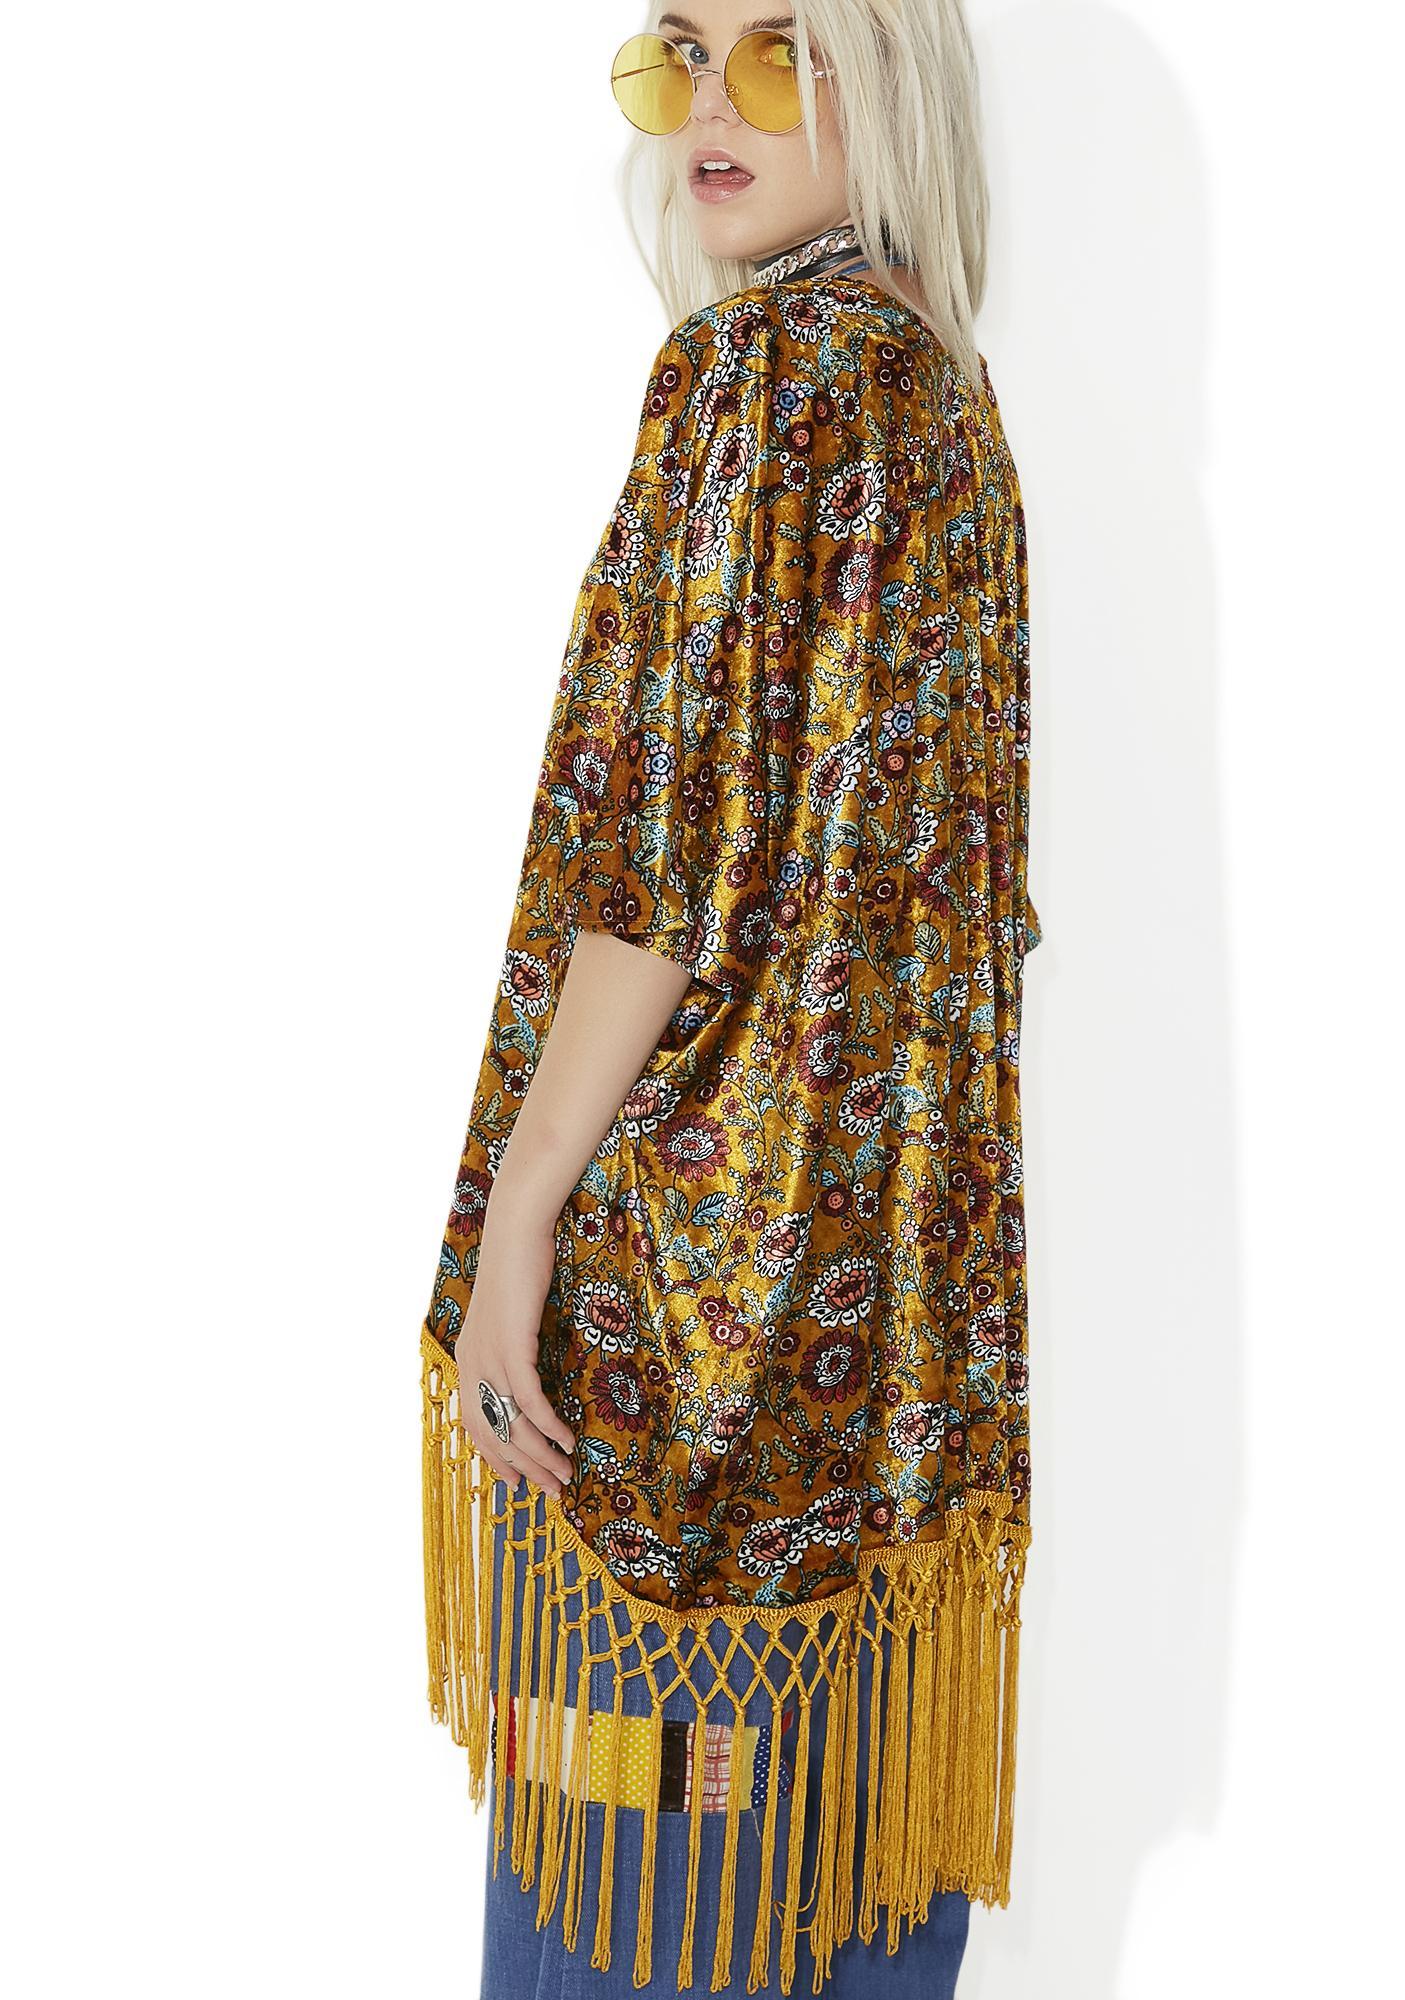 As I Am Lady Rosalind Kimono